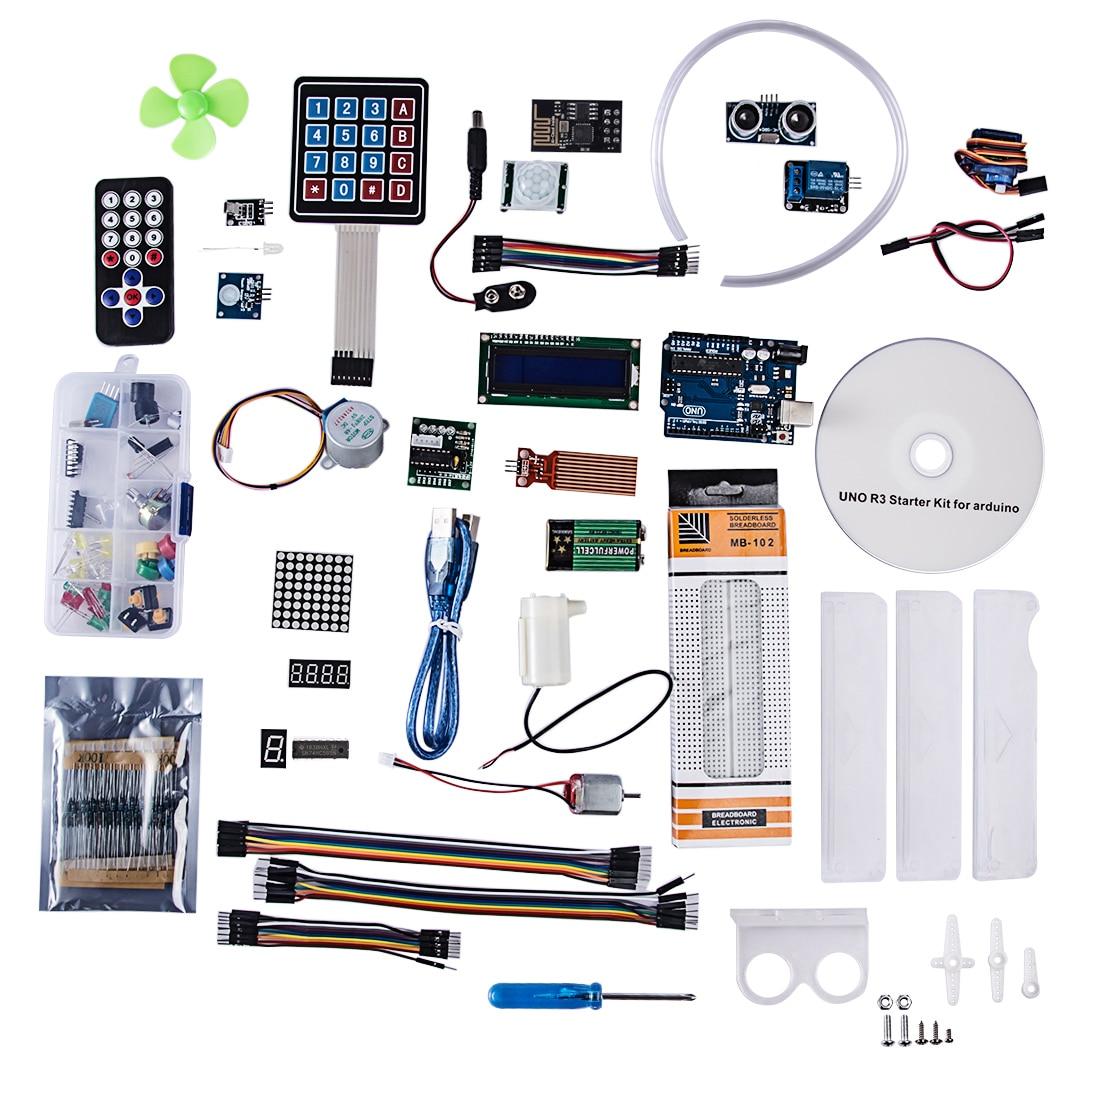 Modiker 28 Sensors For UNO R3 Deluxe Basic Starter Kit For Beginner With Wifi Module With CD Tutorial For Arduino Programmable